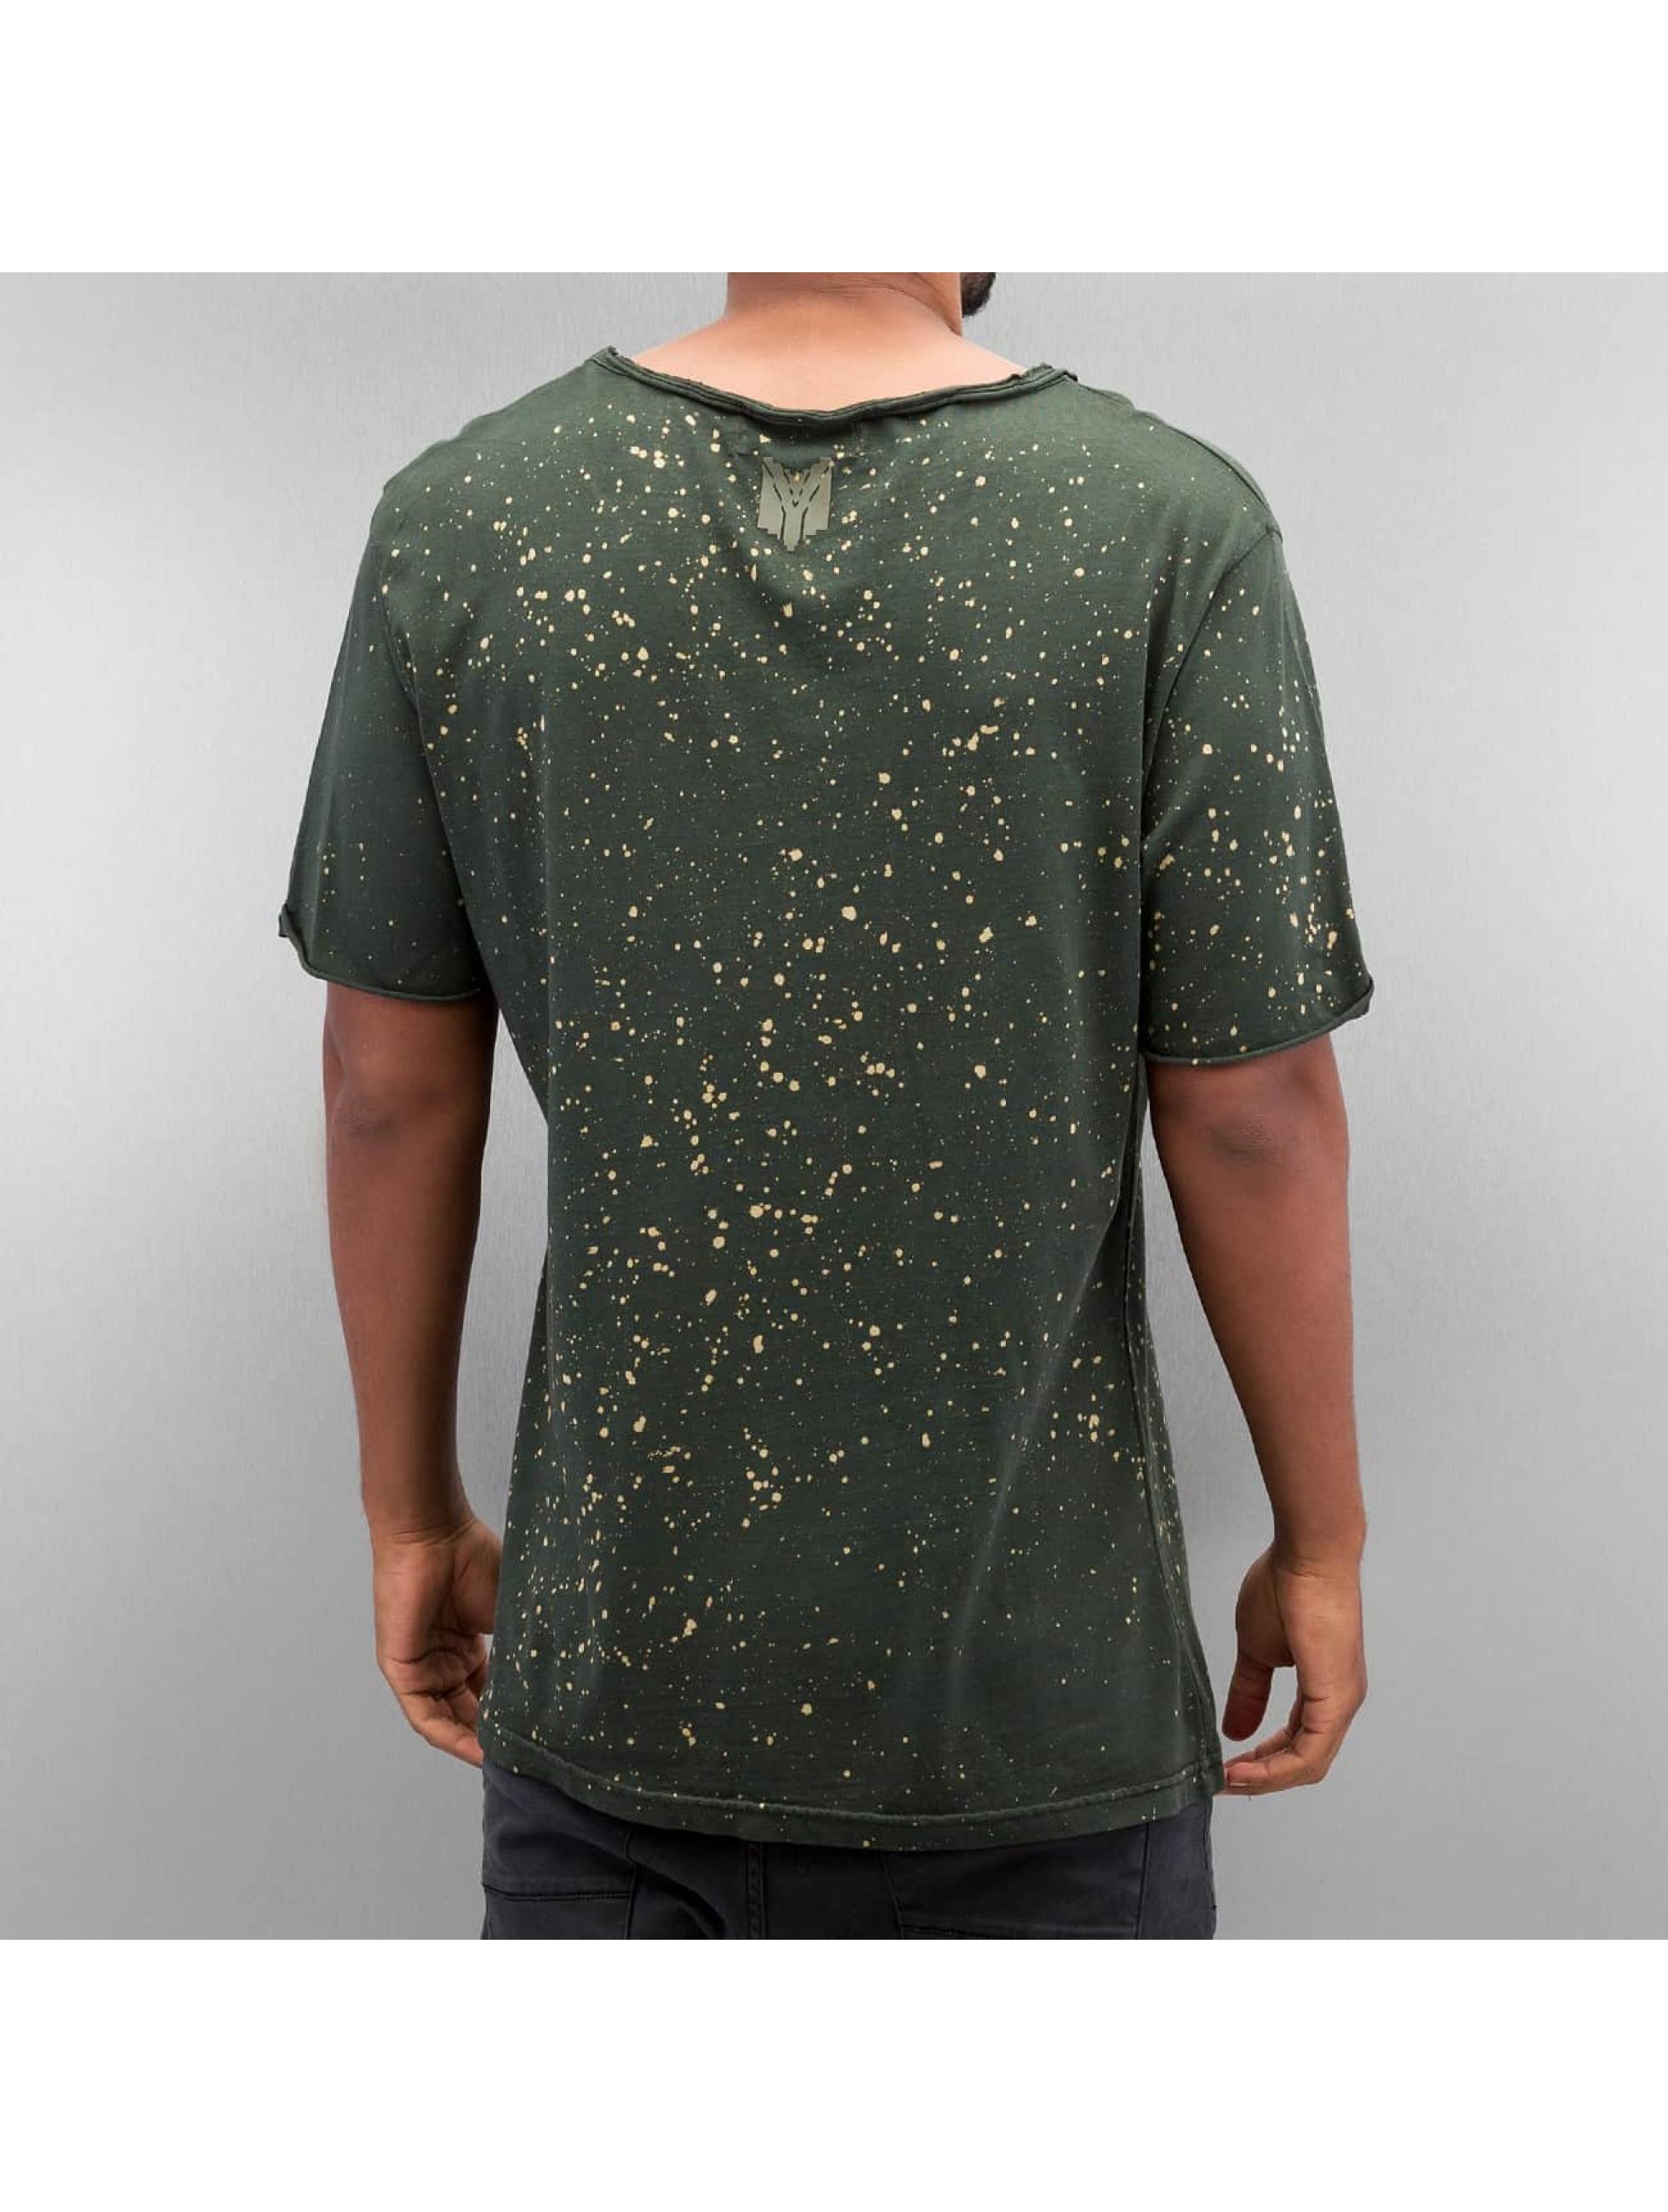 Yezz T-Shirt Dots olive